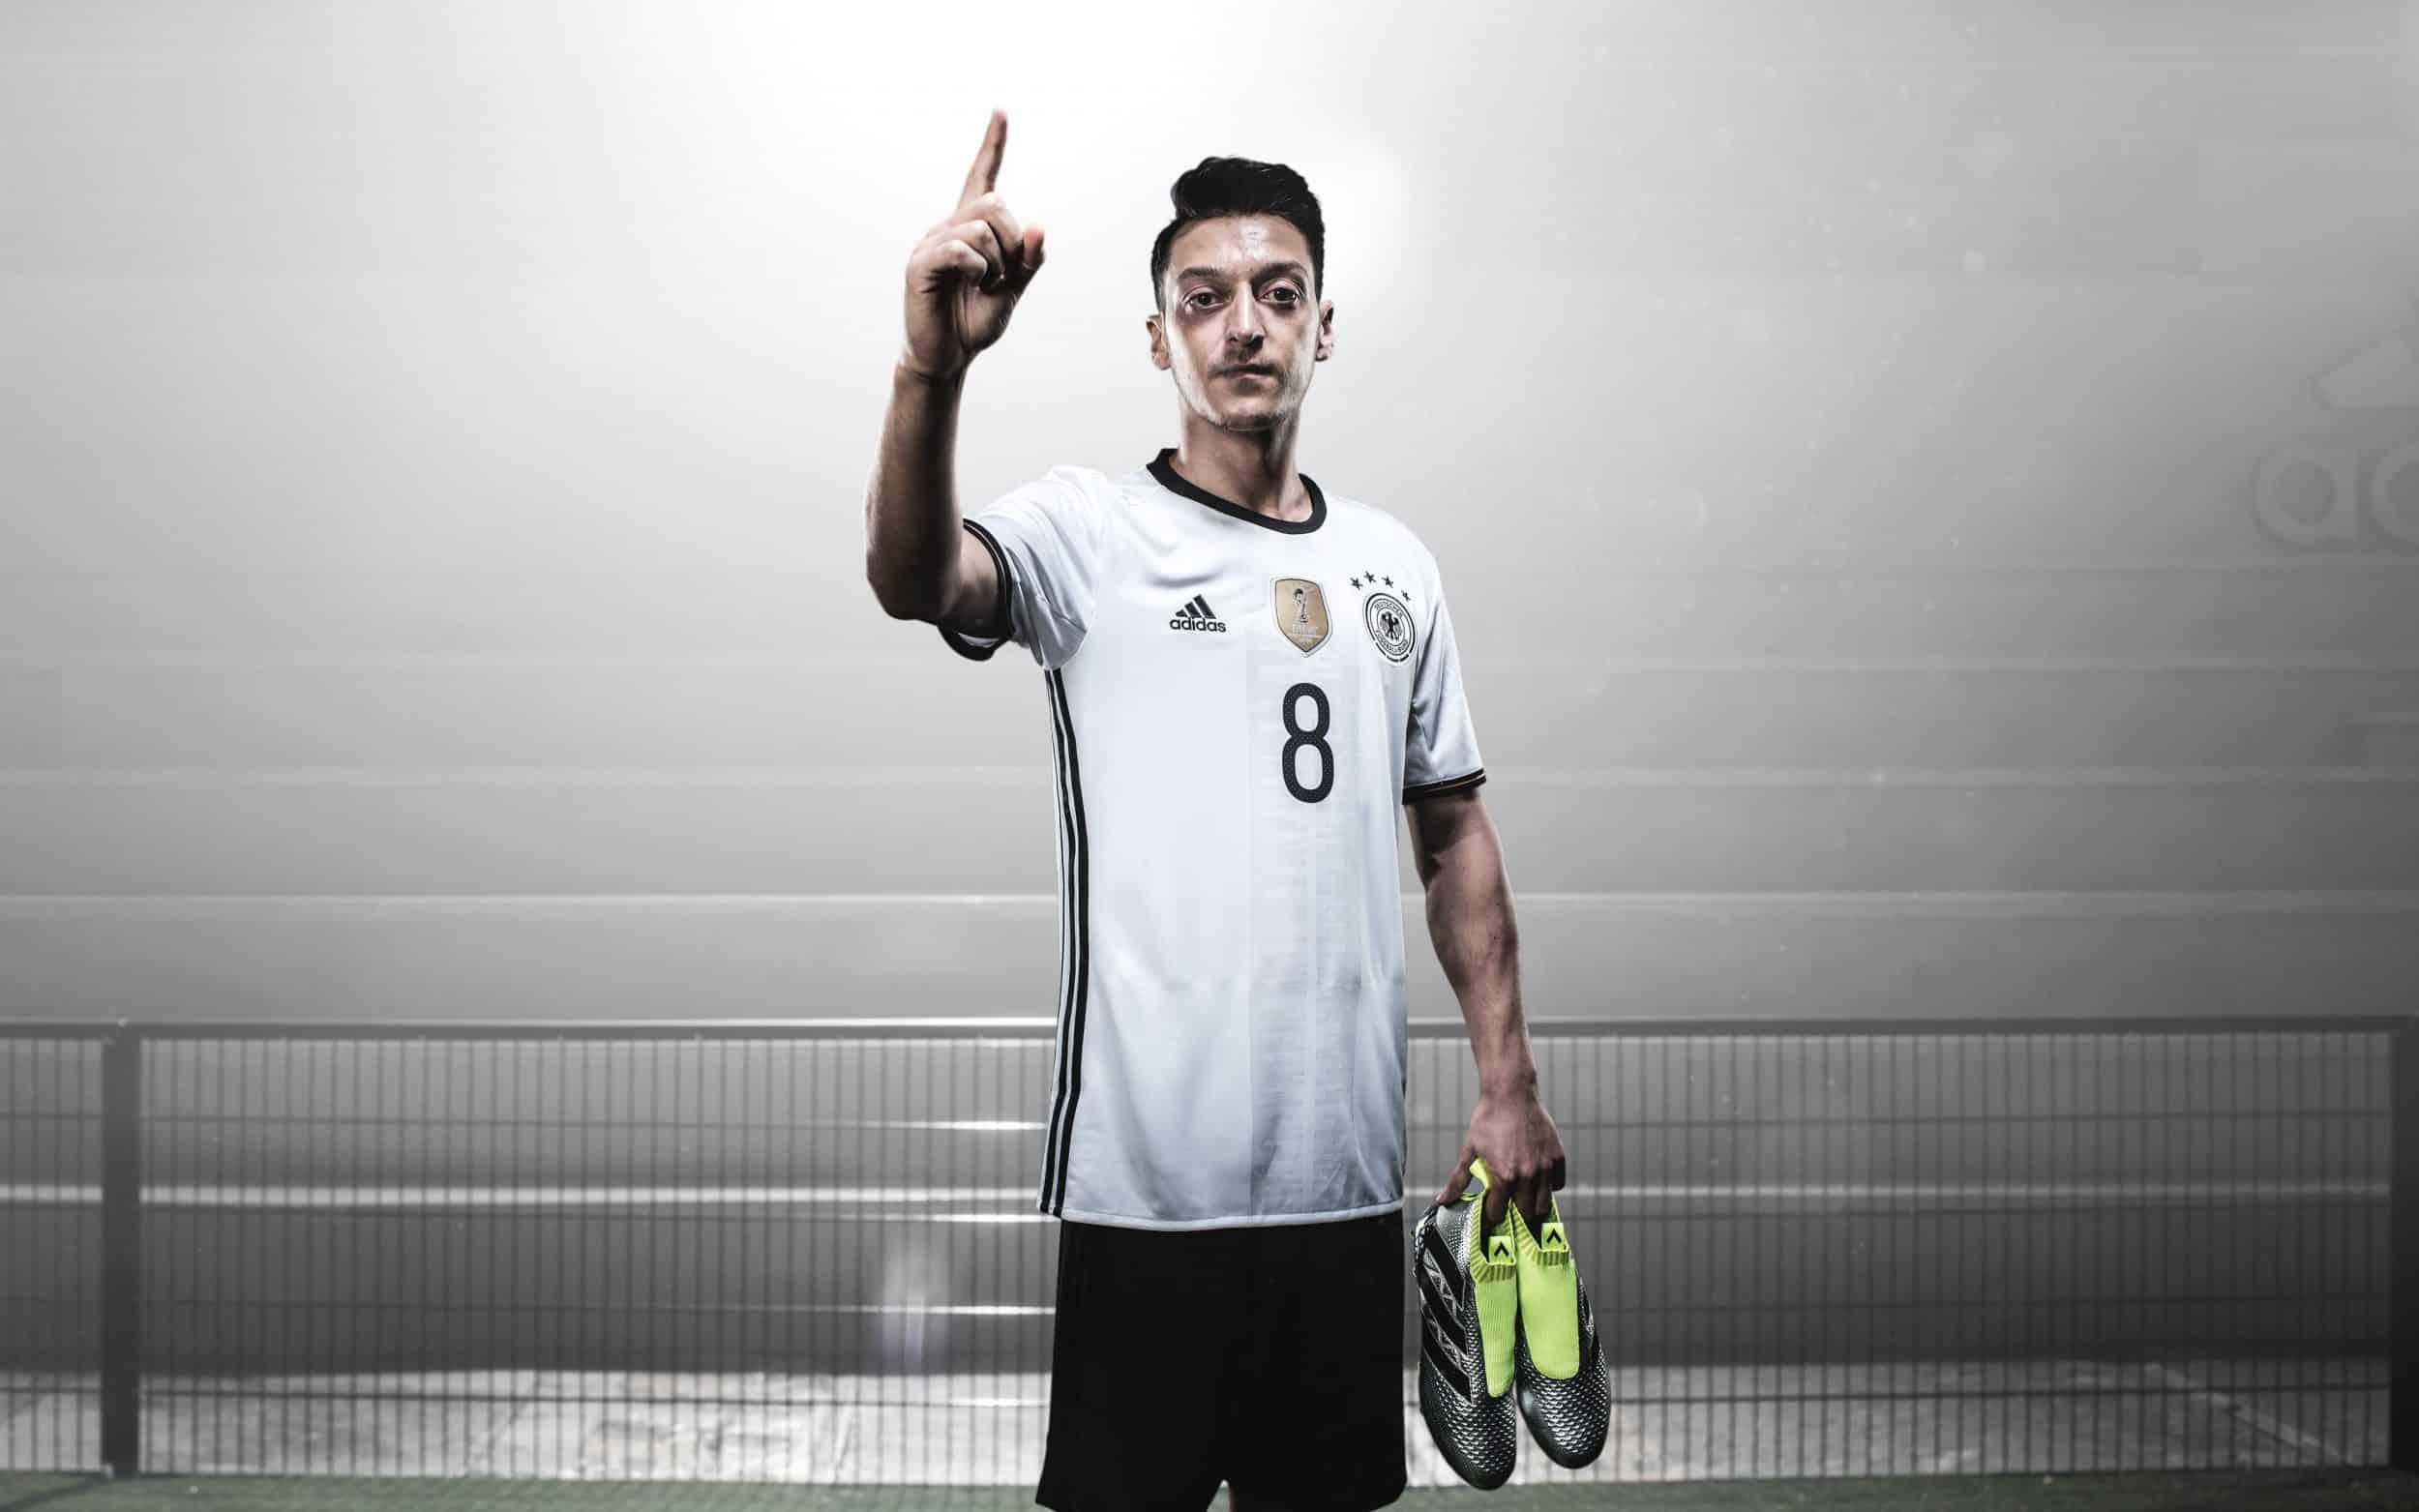 chaussure-football-adidas-ACE16-euro-2016-ozil-min